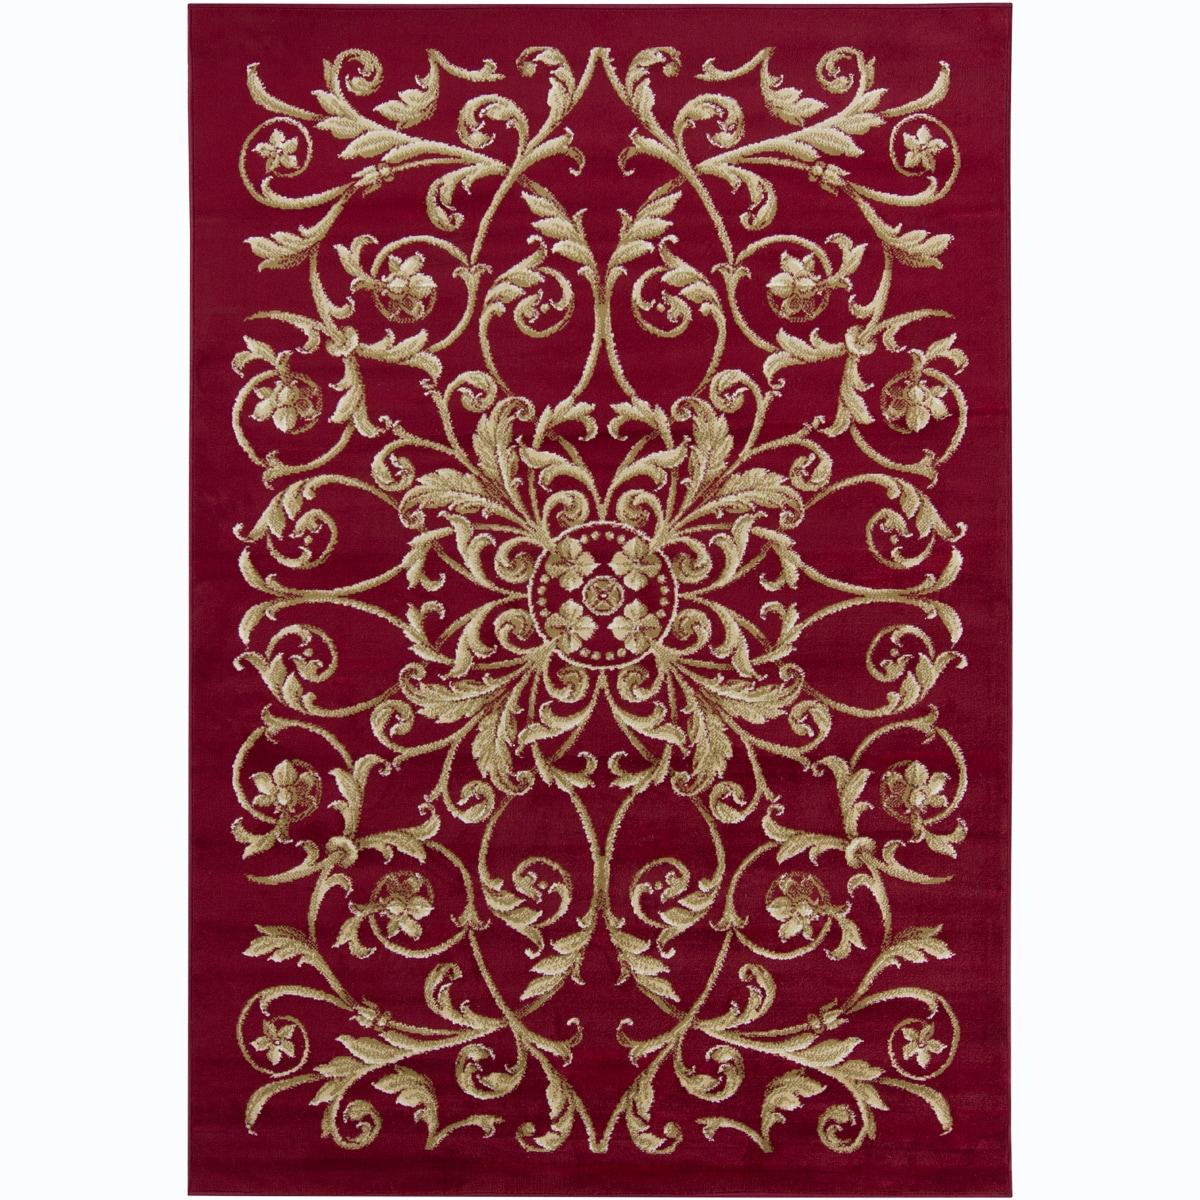 Artist's Loom Indoor Transitional Floral Rug (8' x 11'2)